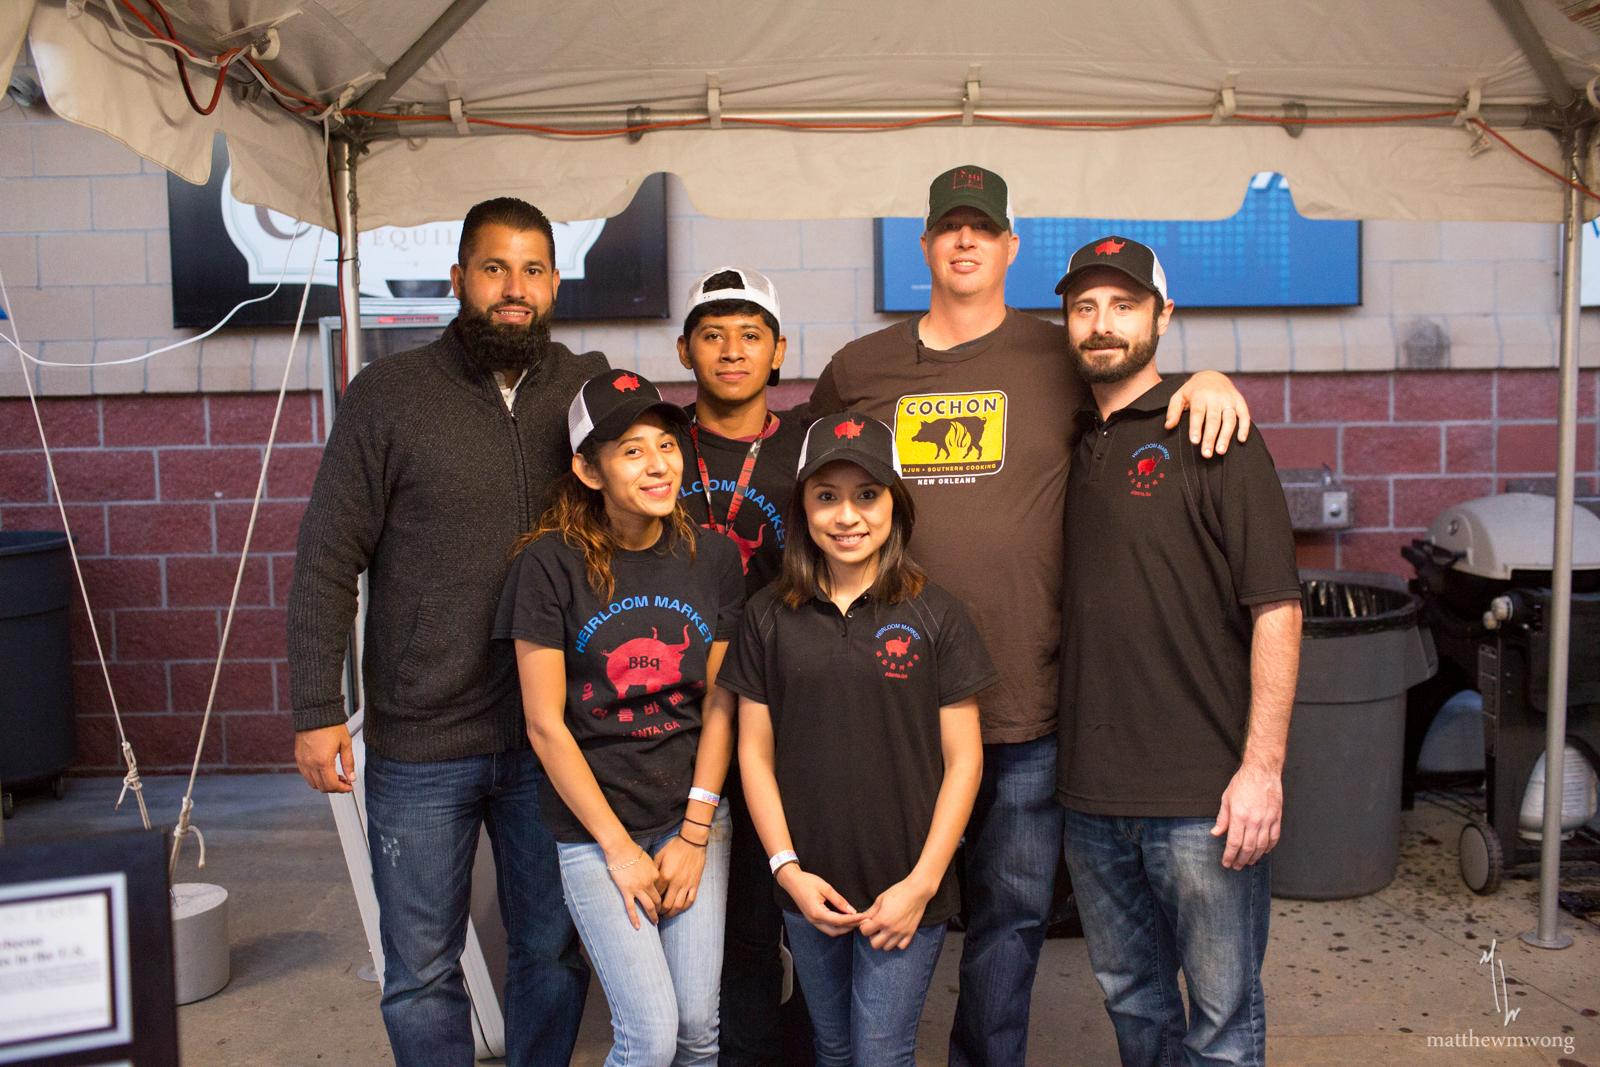 Chef Cody Taylor's team at Heirloom Market BBQ